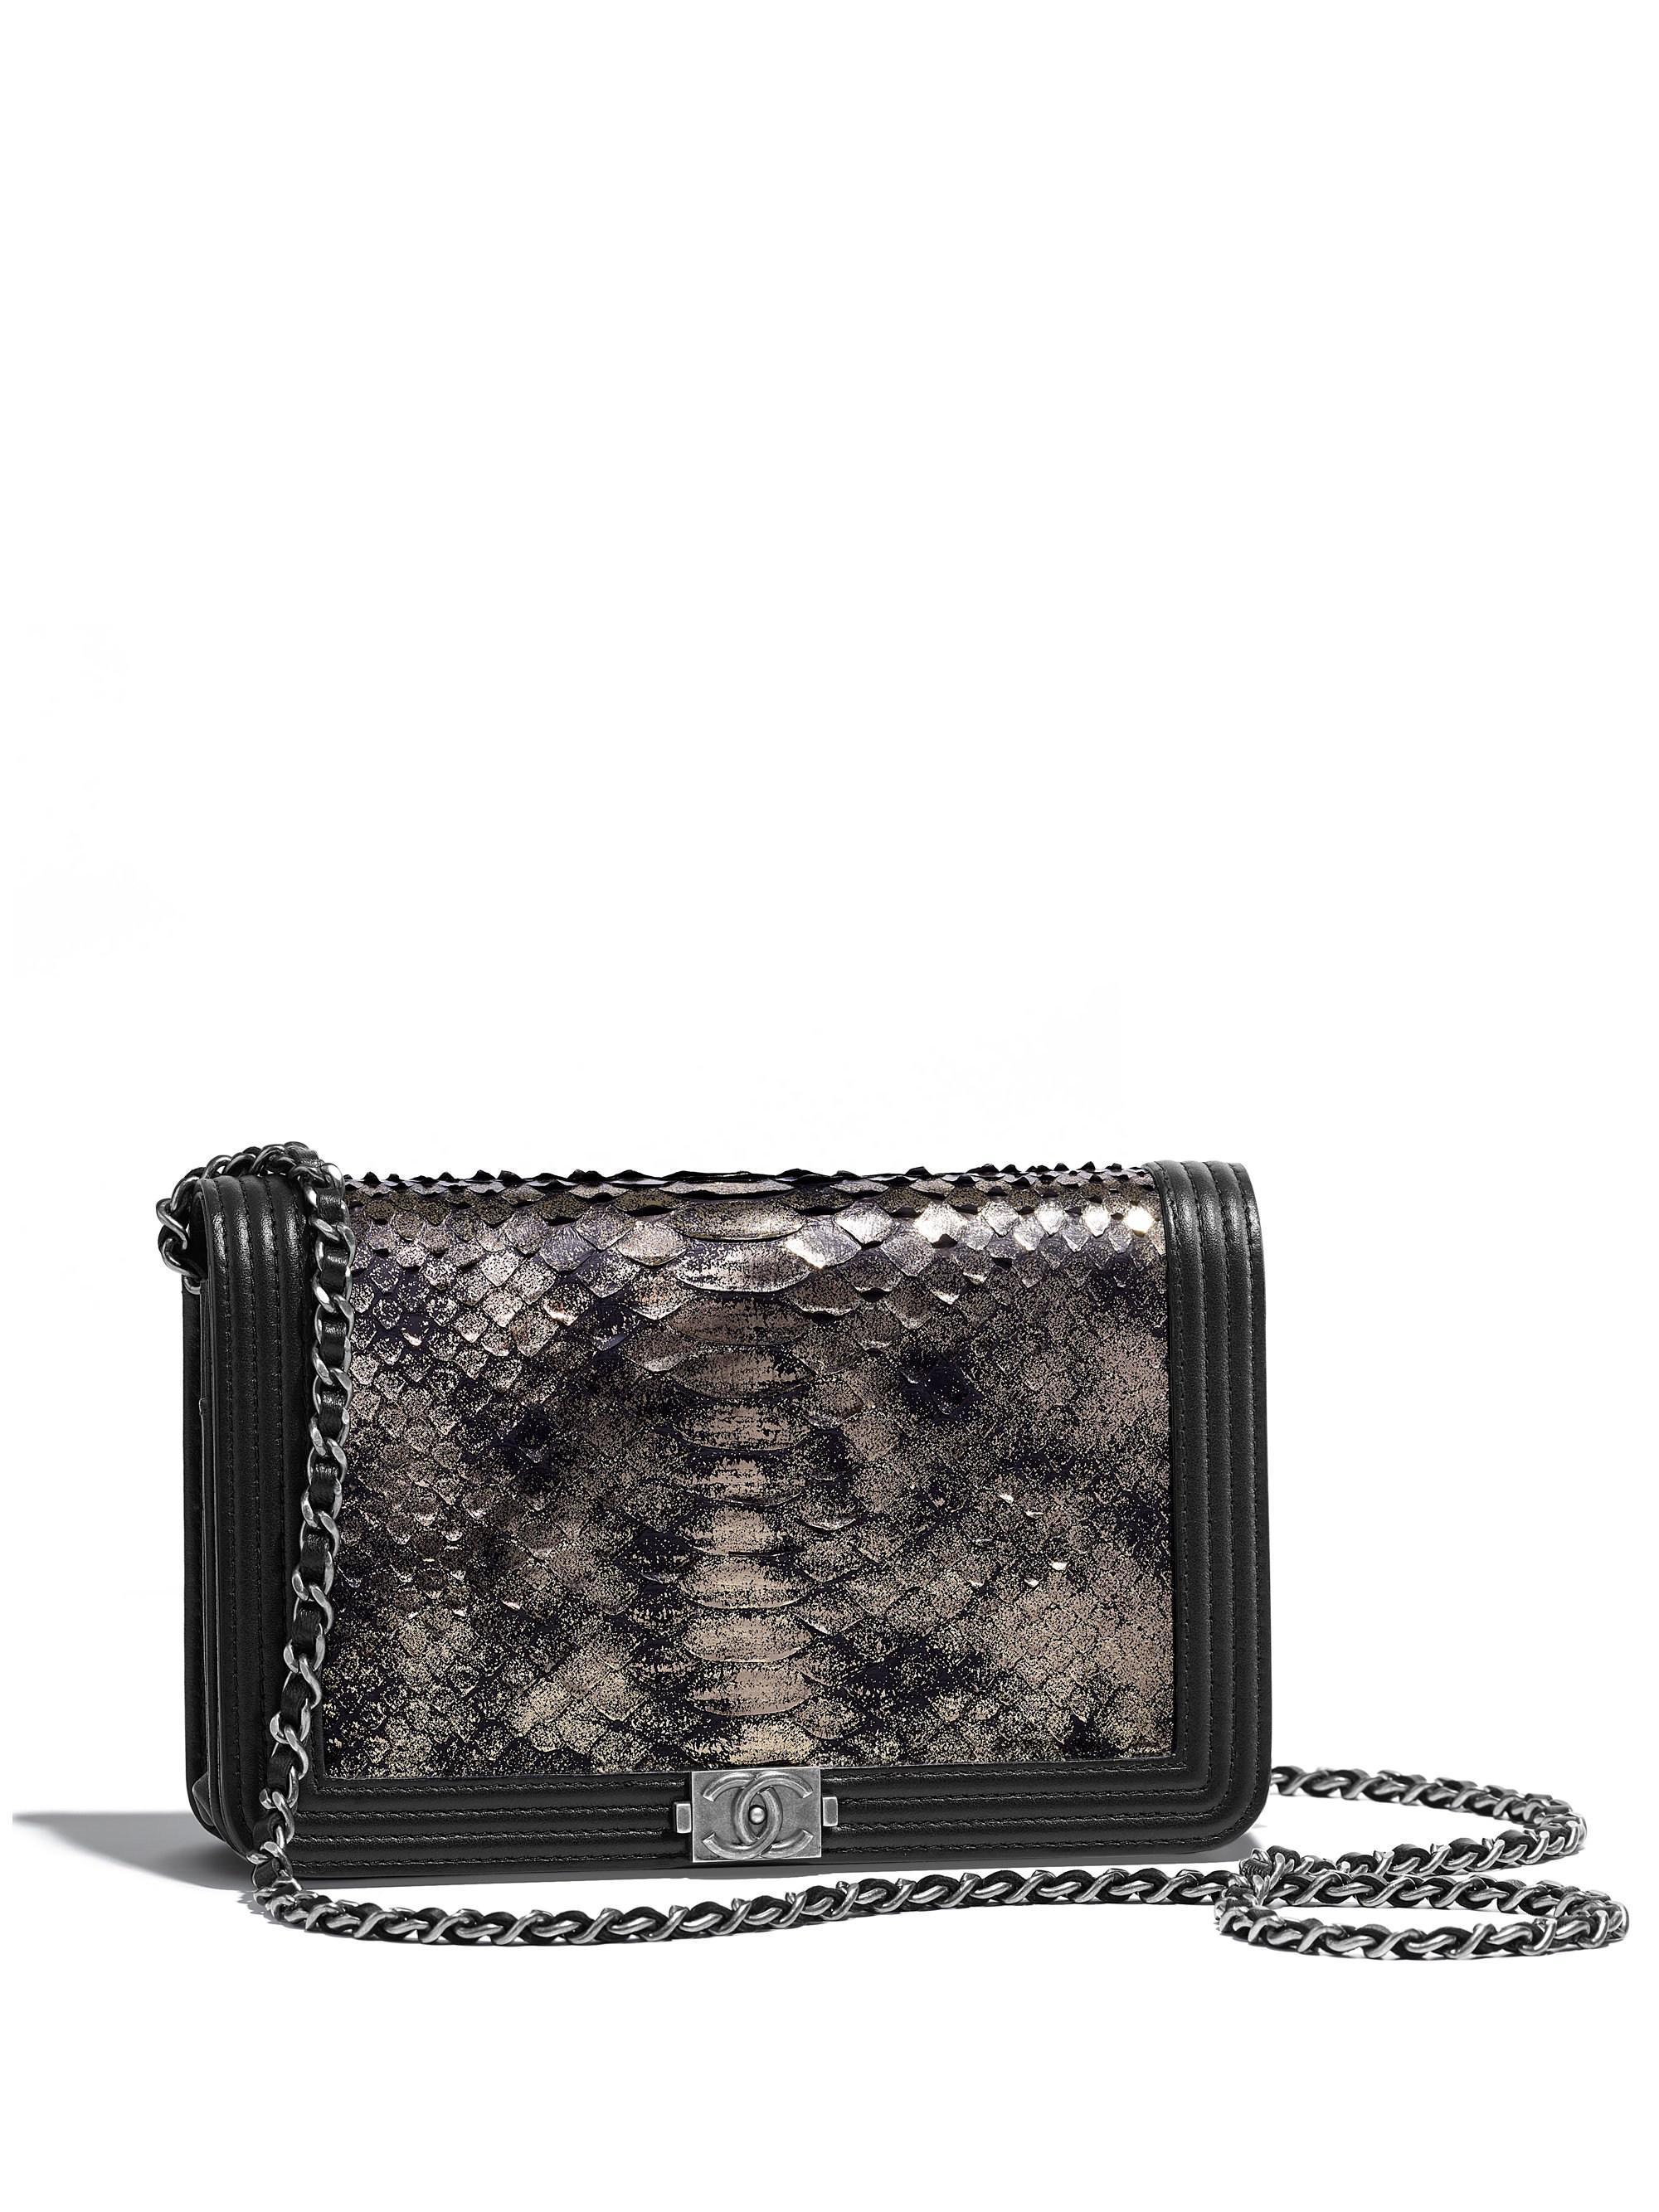 Saks Fifth Ave Chanel Bags Style Guru Fashion Glitz Glamour